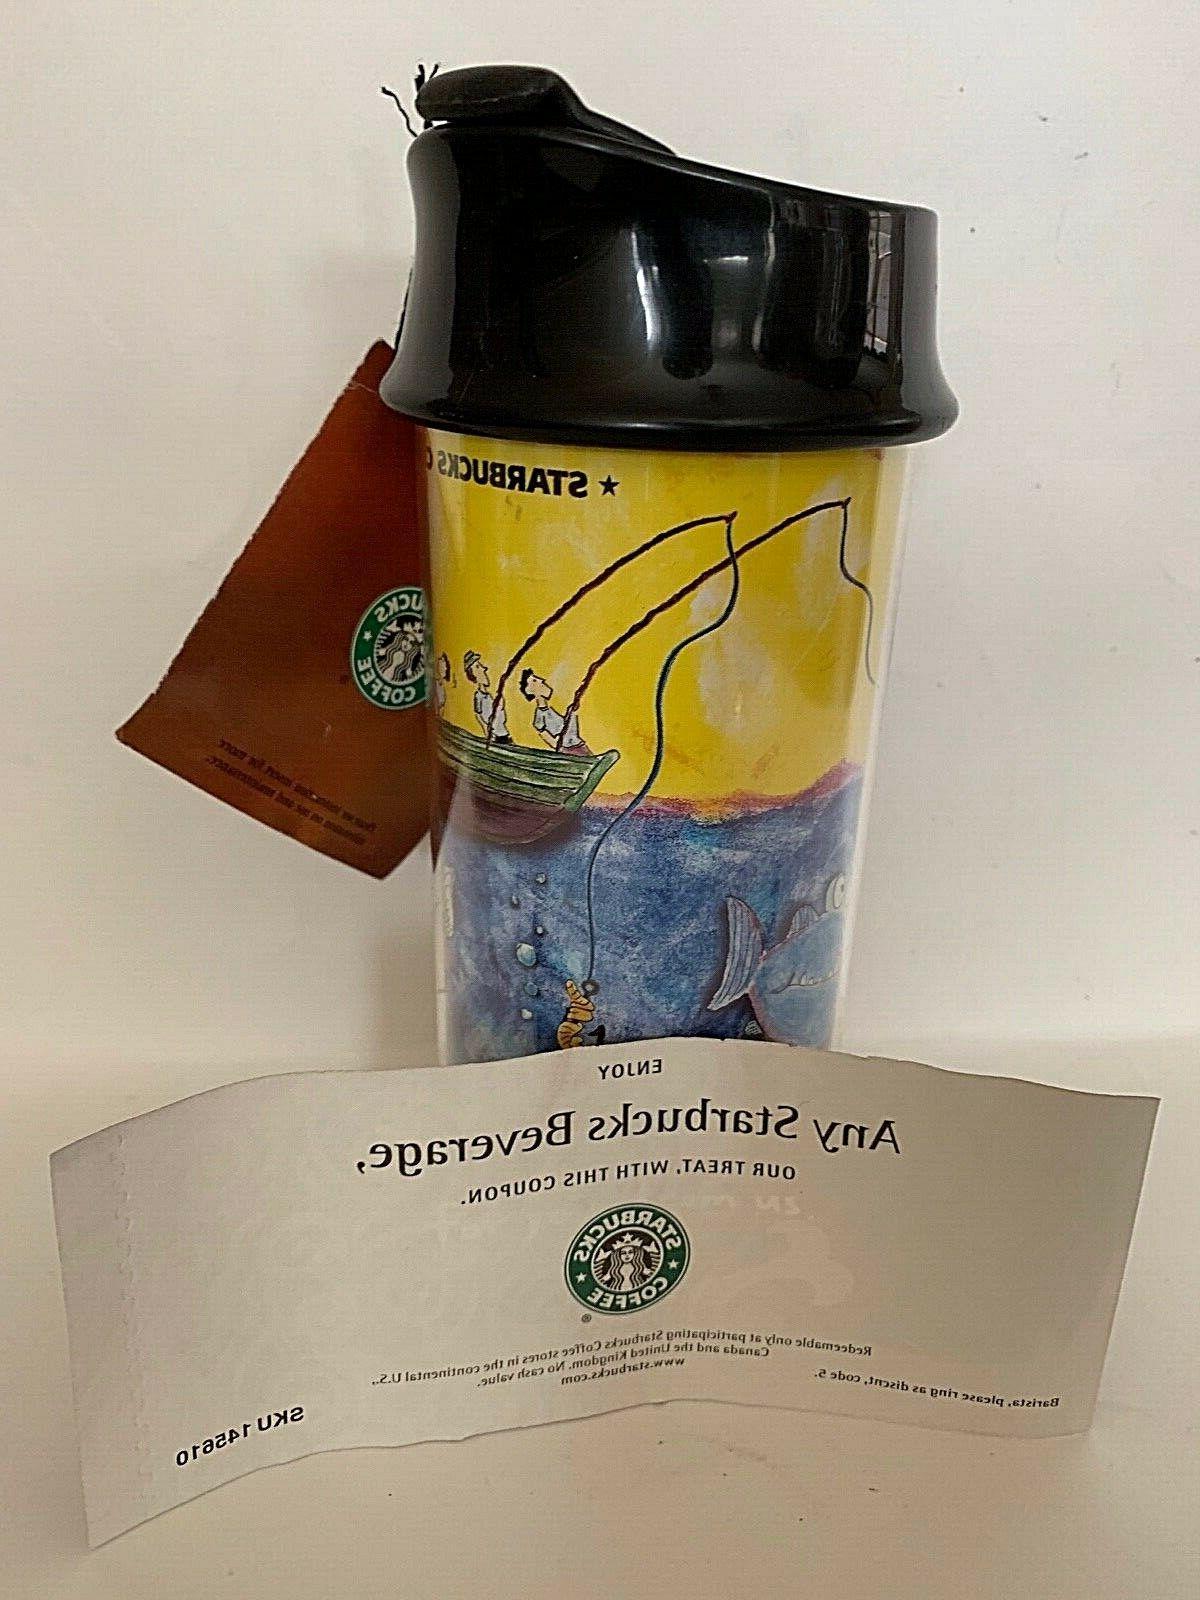 2000 Starbucks Coupon